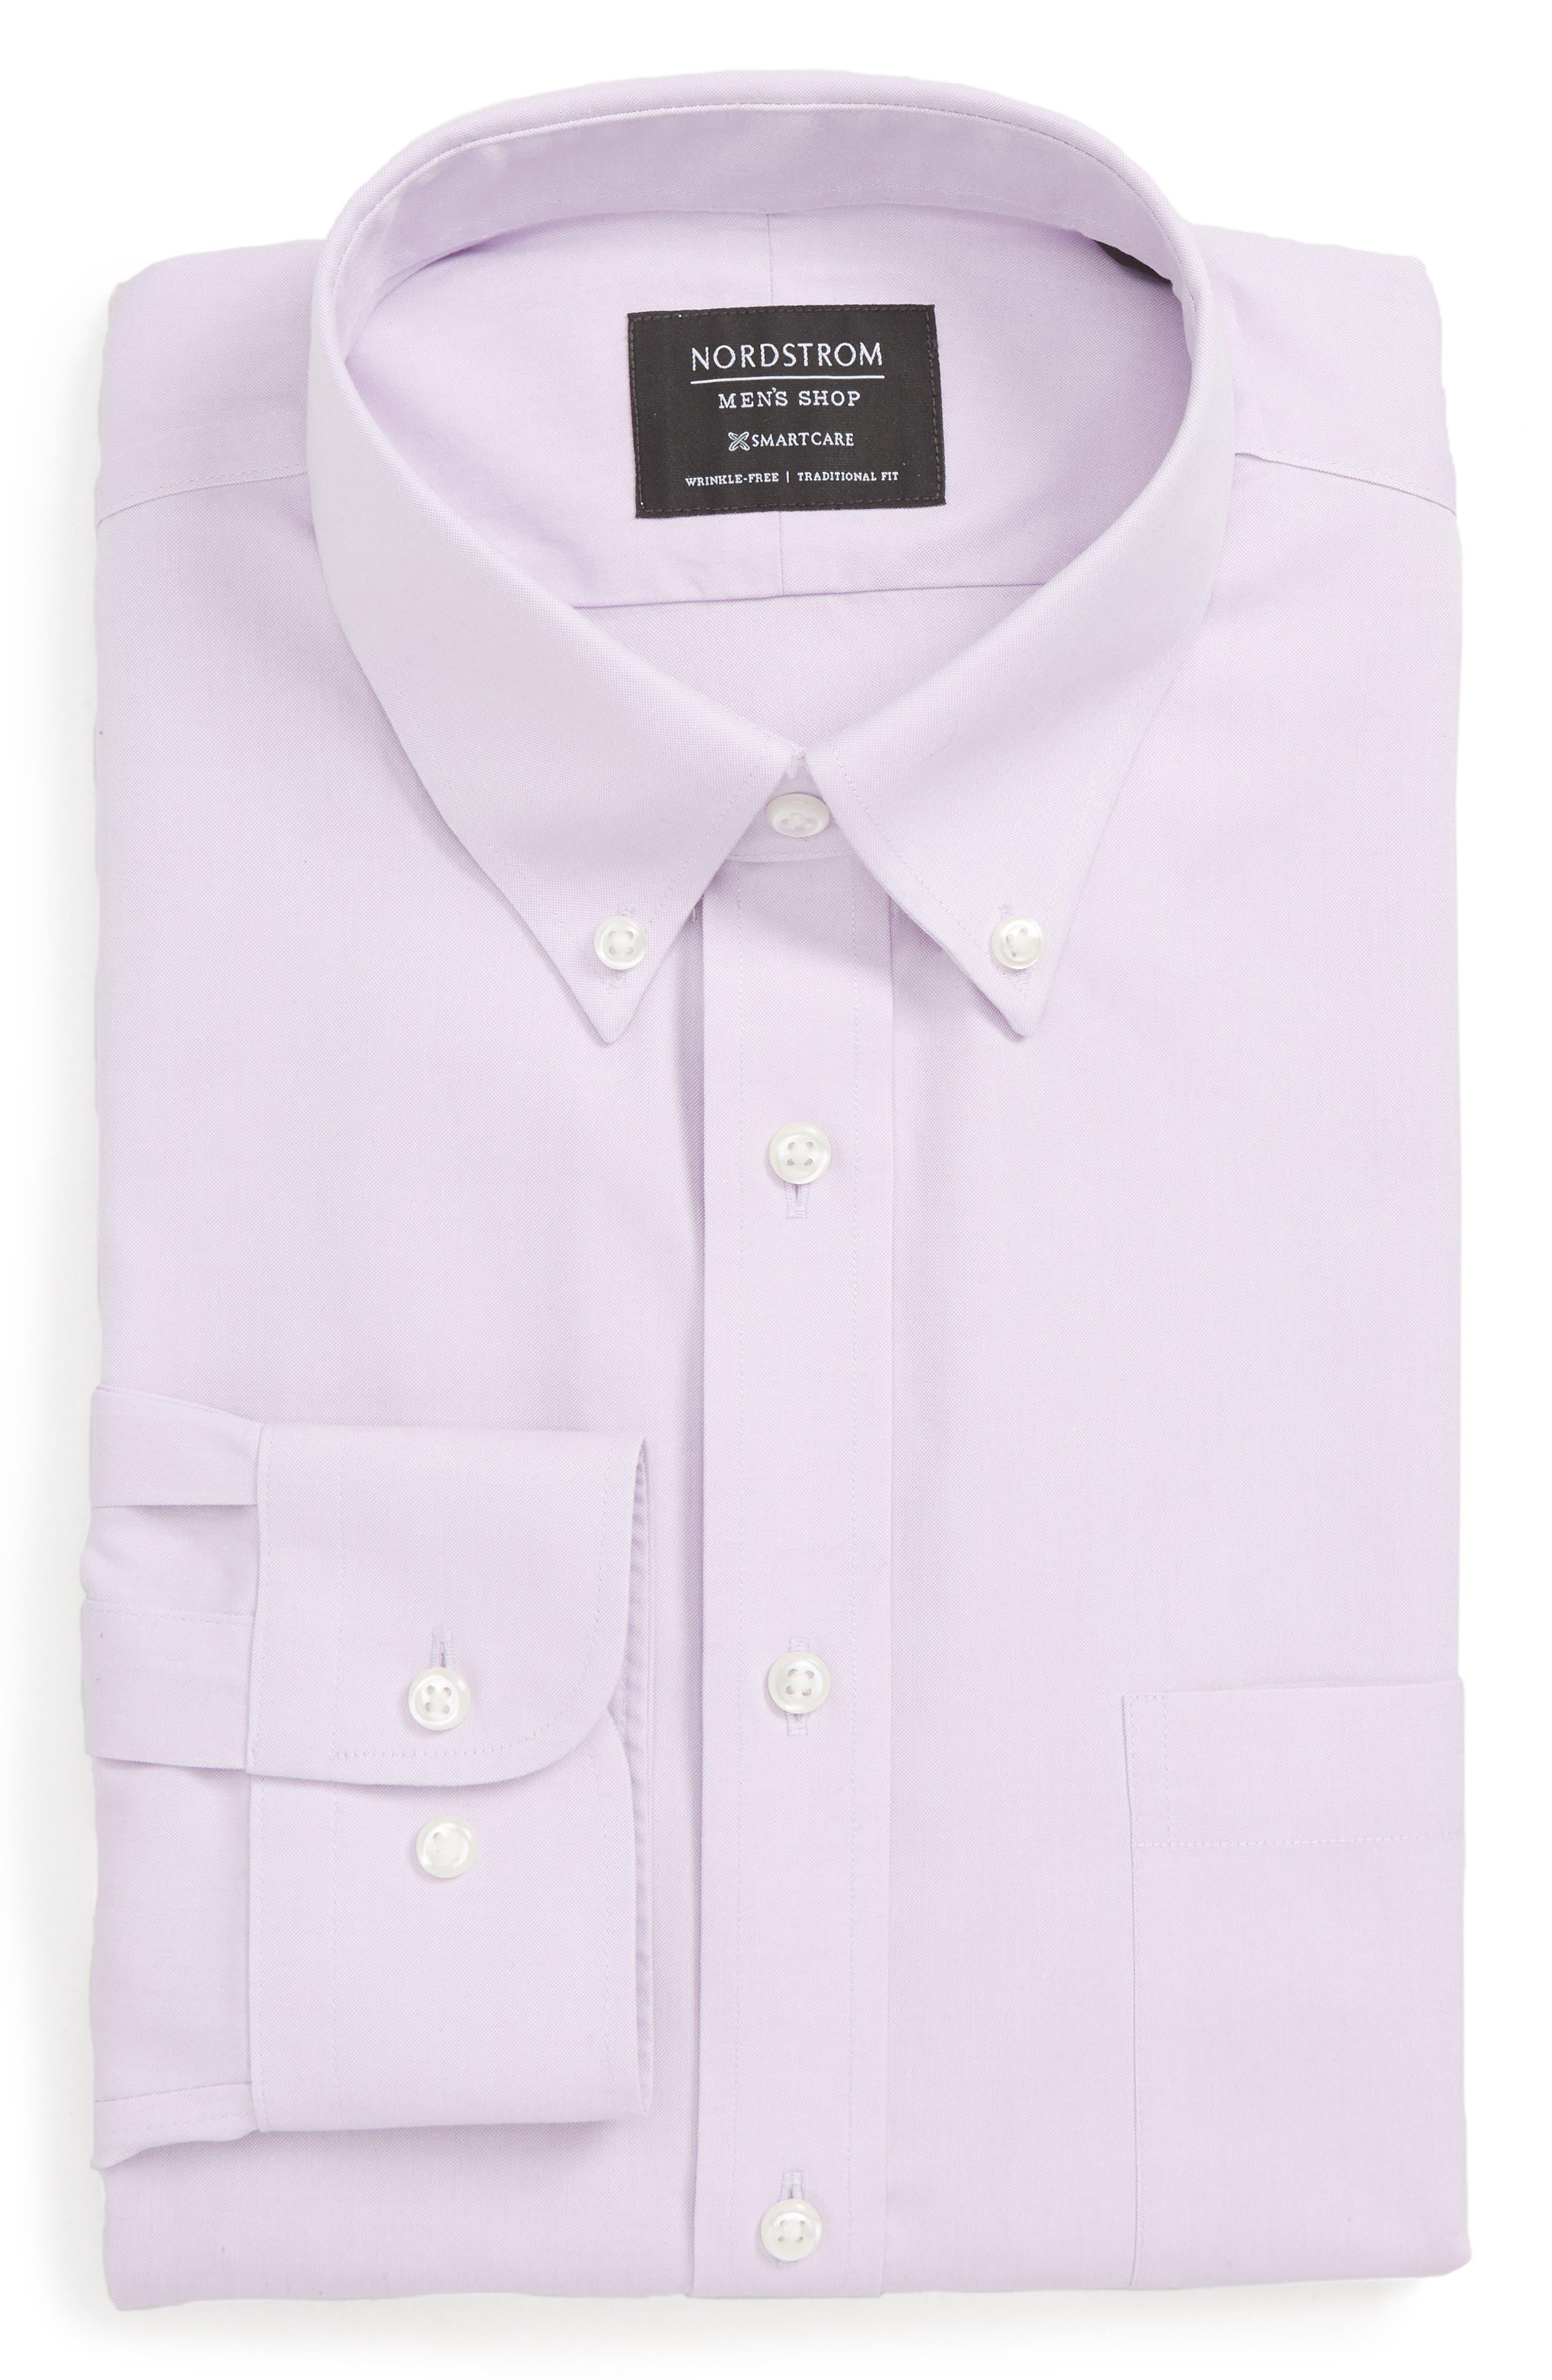 Nordstrom Shop Smartcare(TM) Traditional Fit Pinpoint Dress Shirt, 5.5 34/35 - Purple